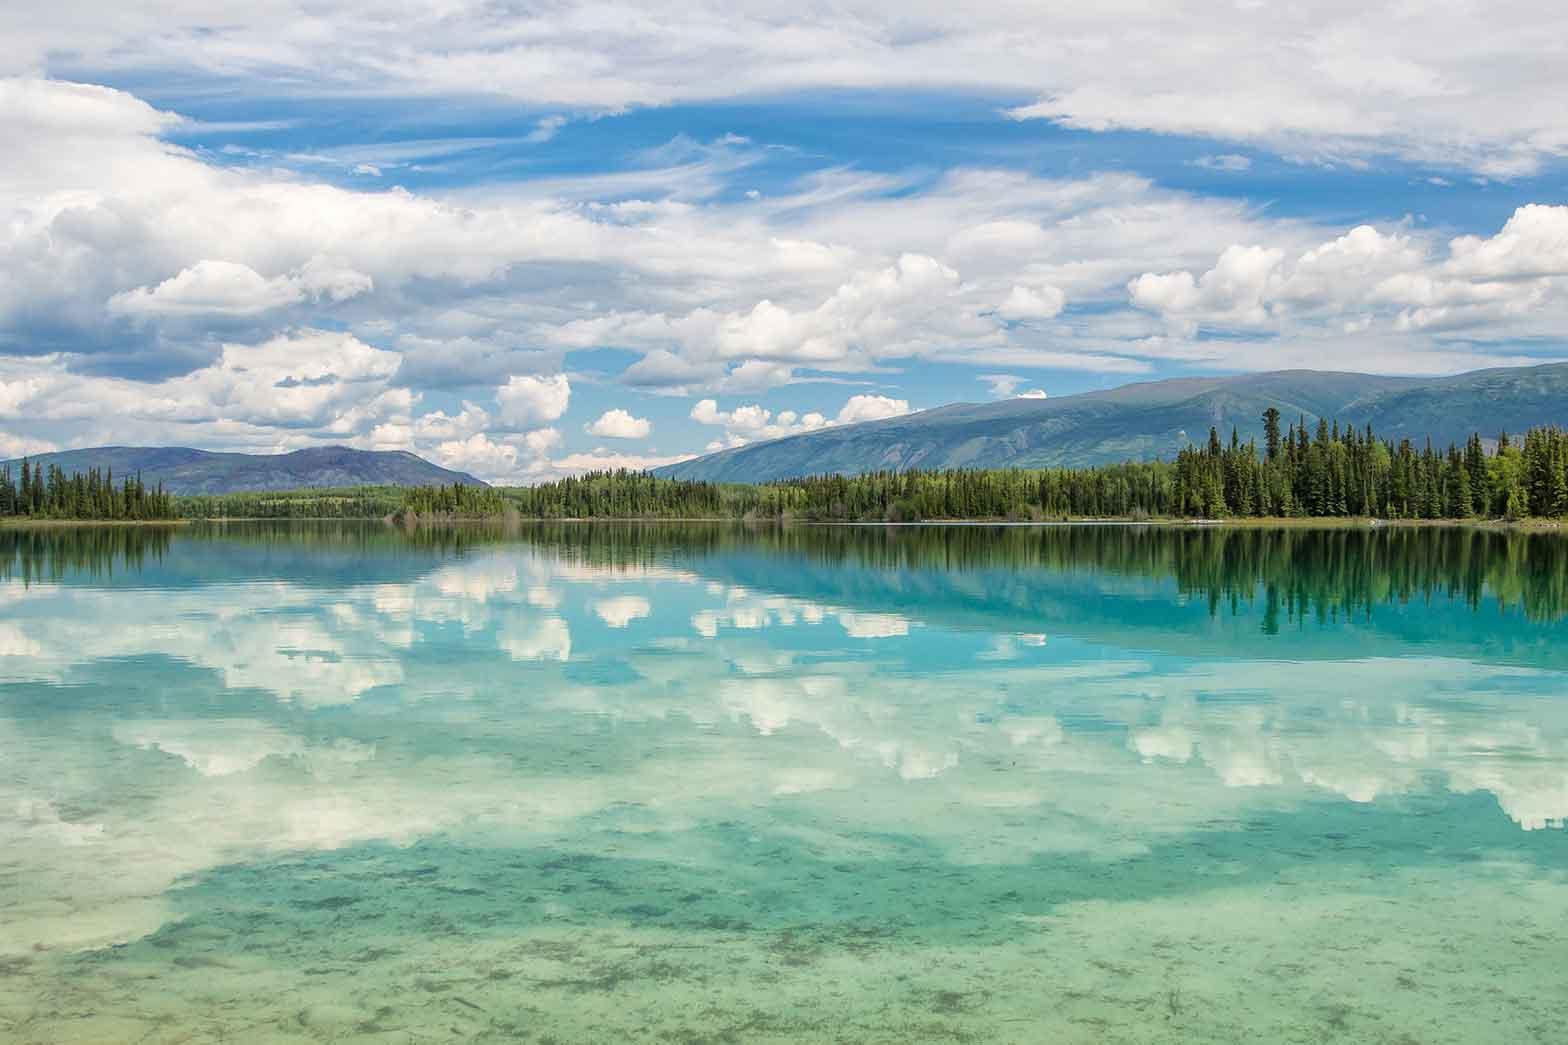 Near Dease lake - British Columbia, Canada